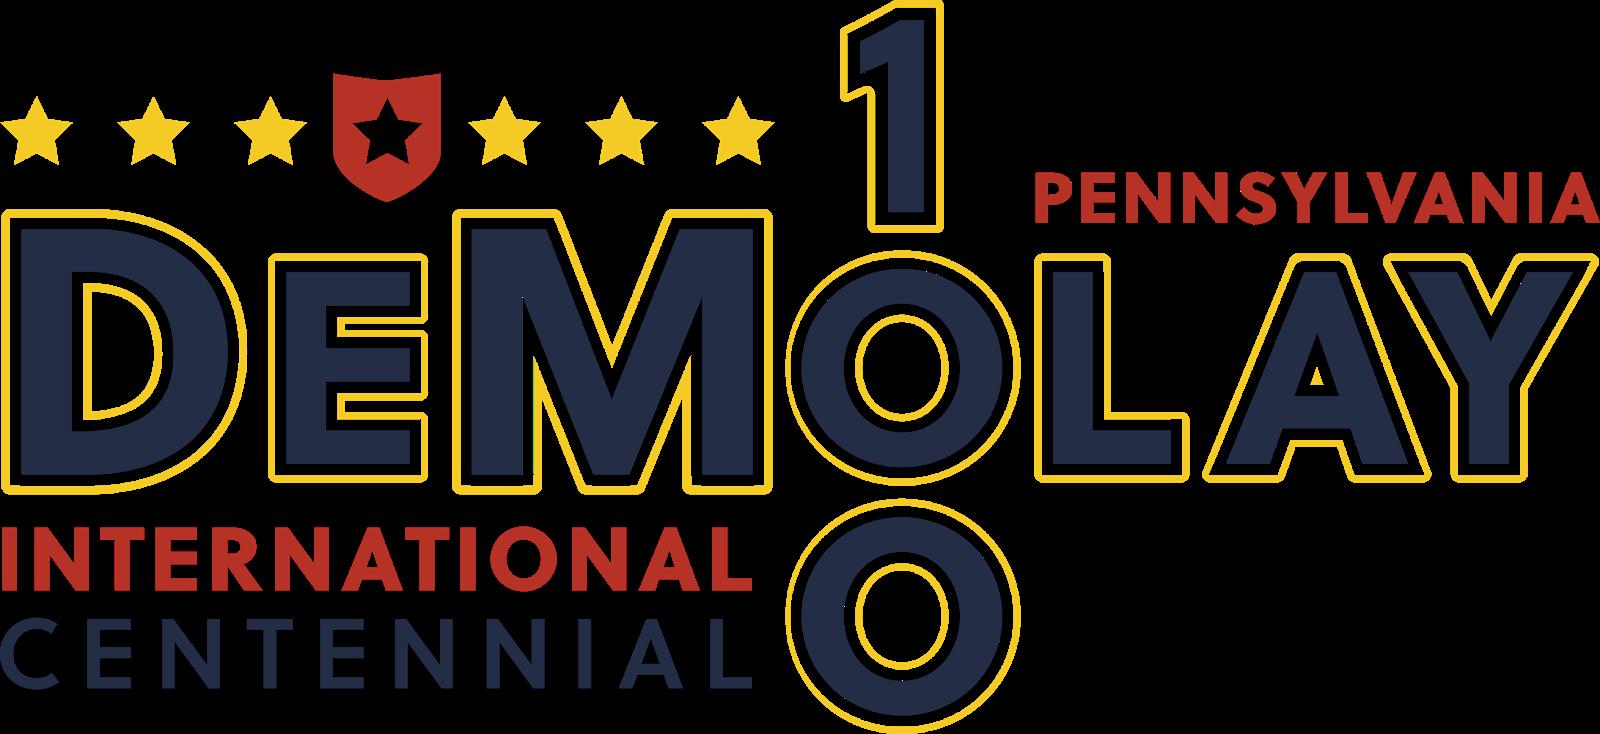 PA DeMolay News and Views: Centennial Memory #51: Flag Football